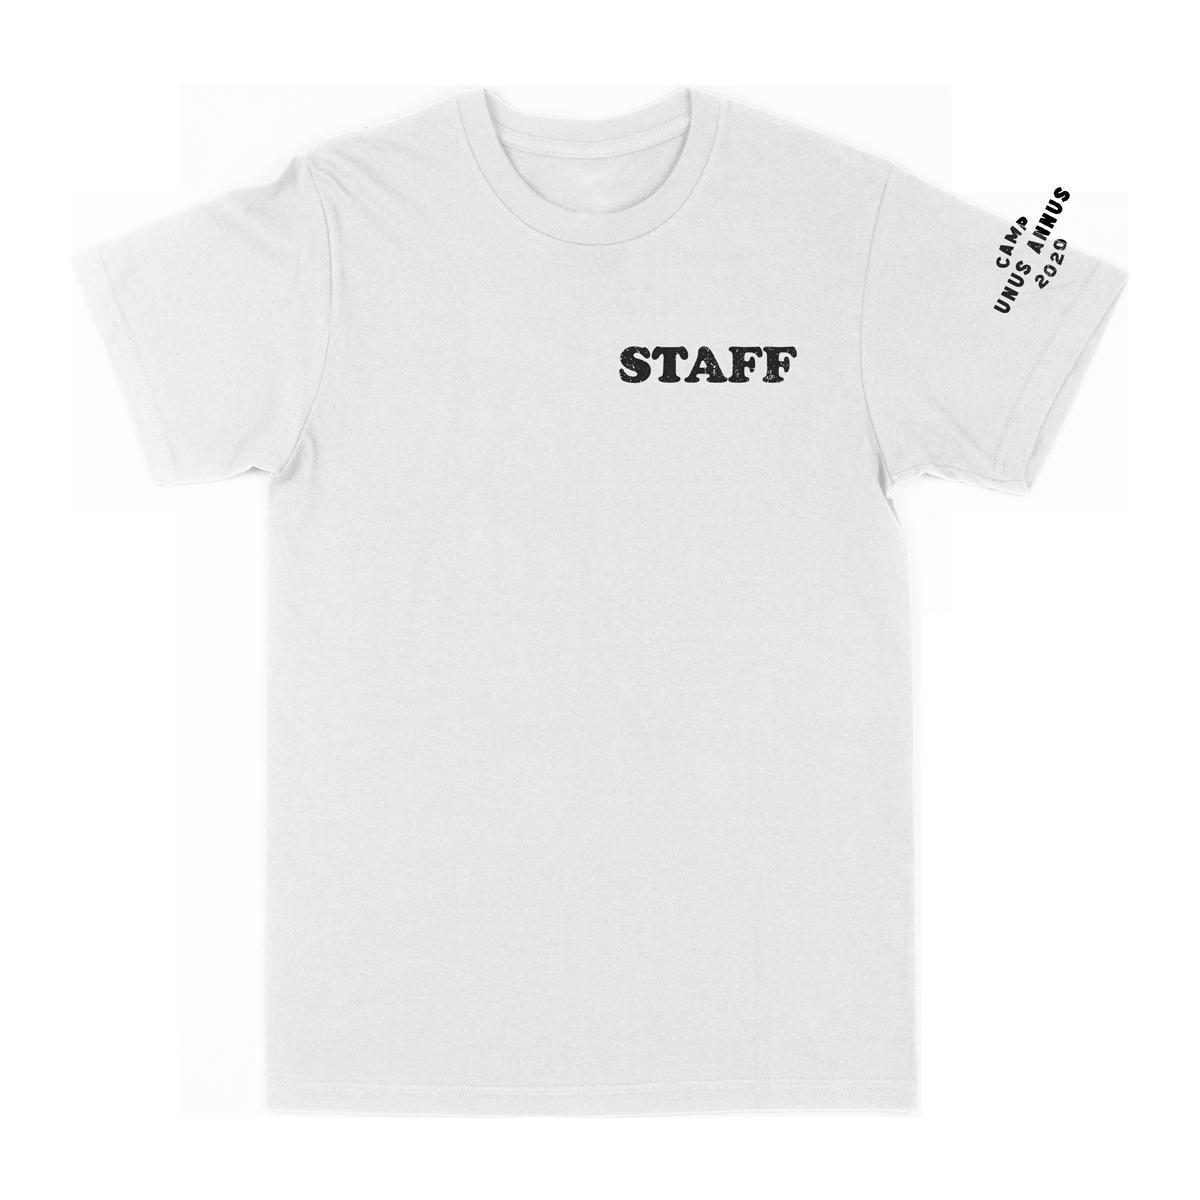 Camp Unus Staff Tee - White